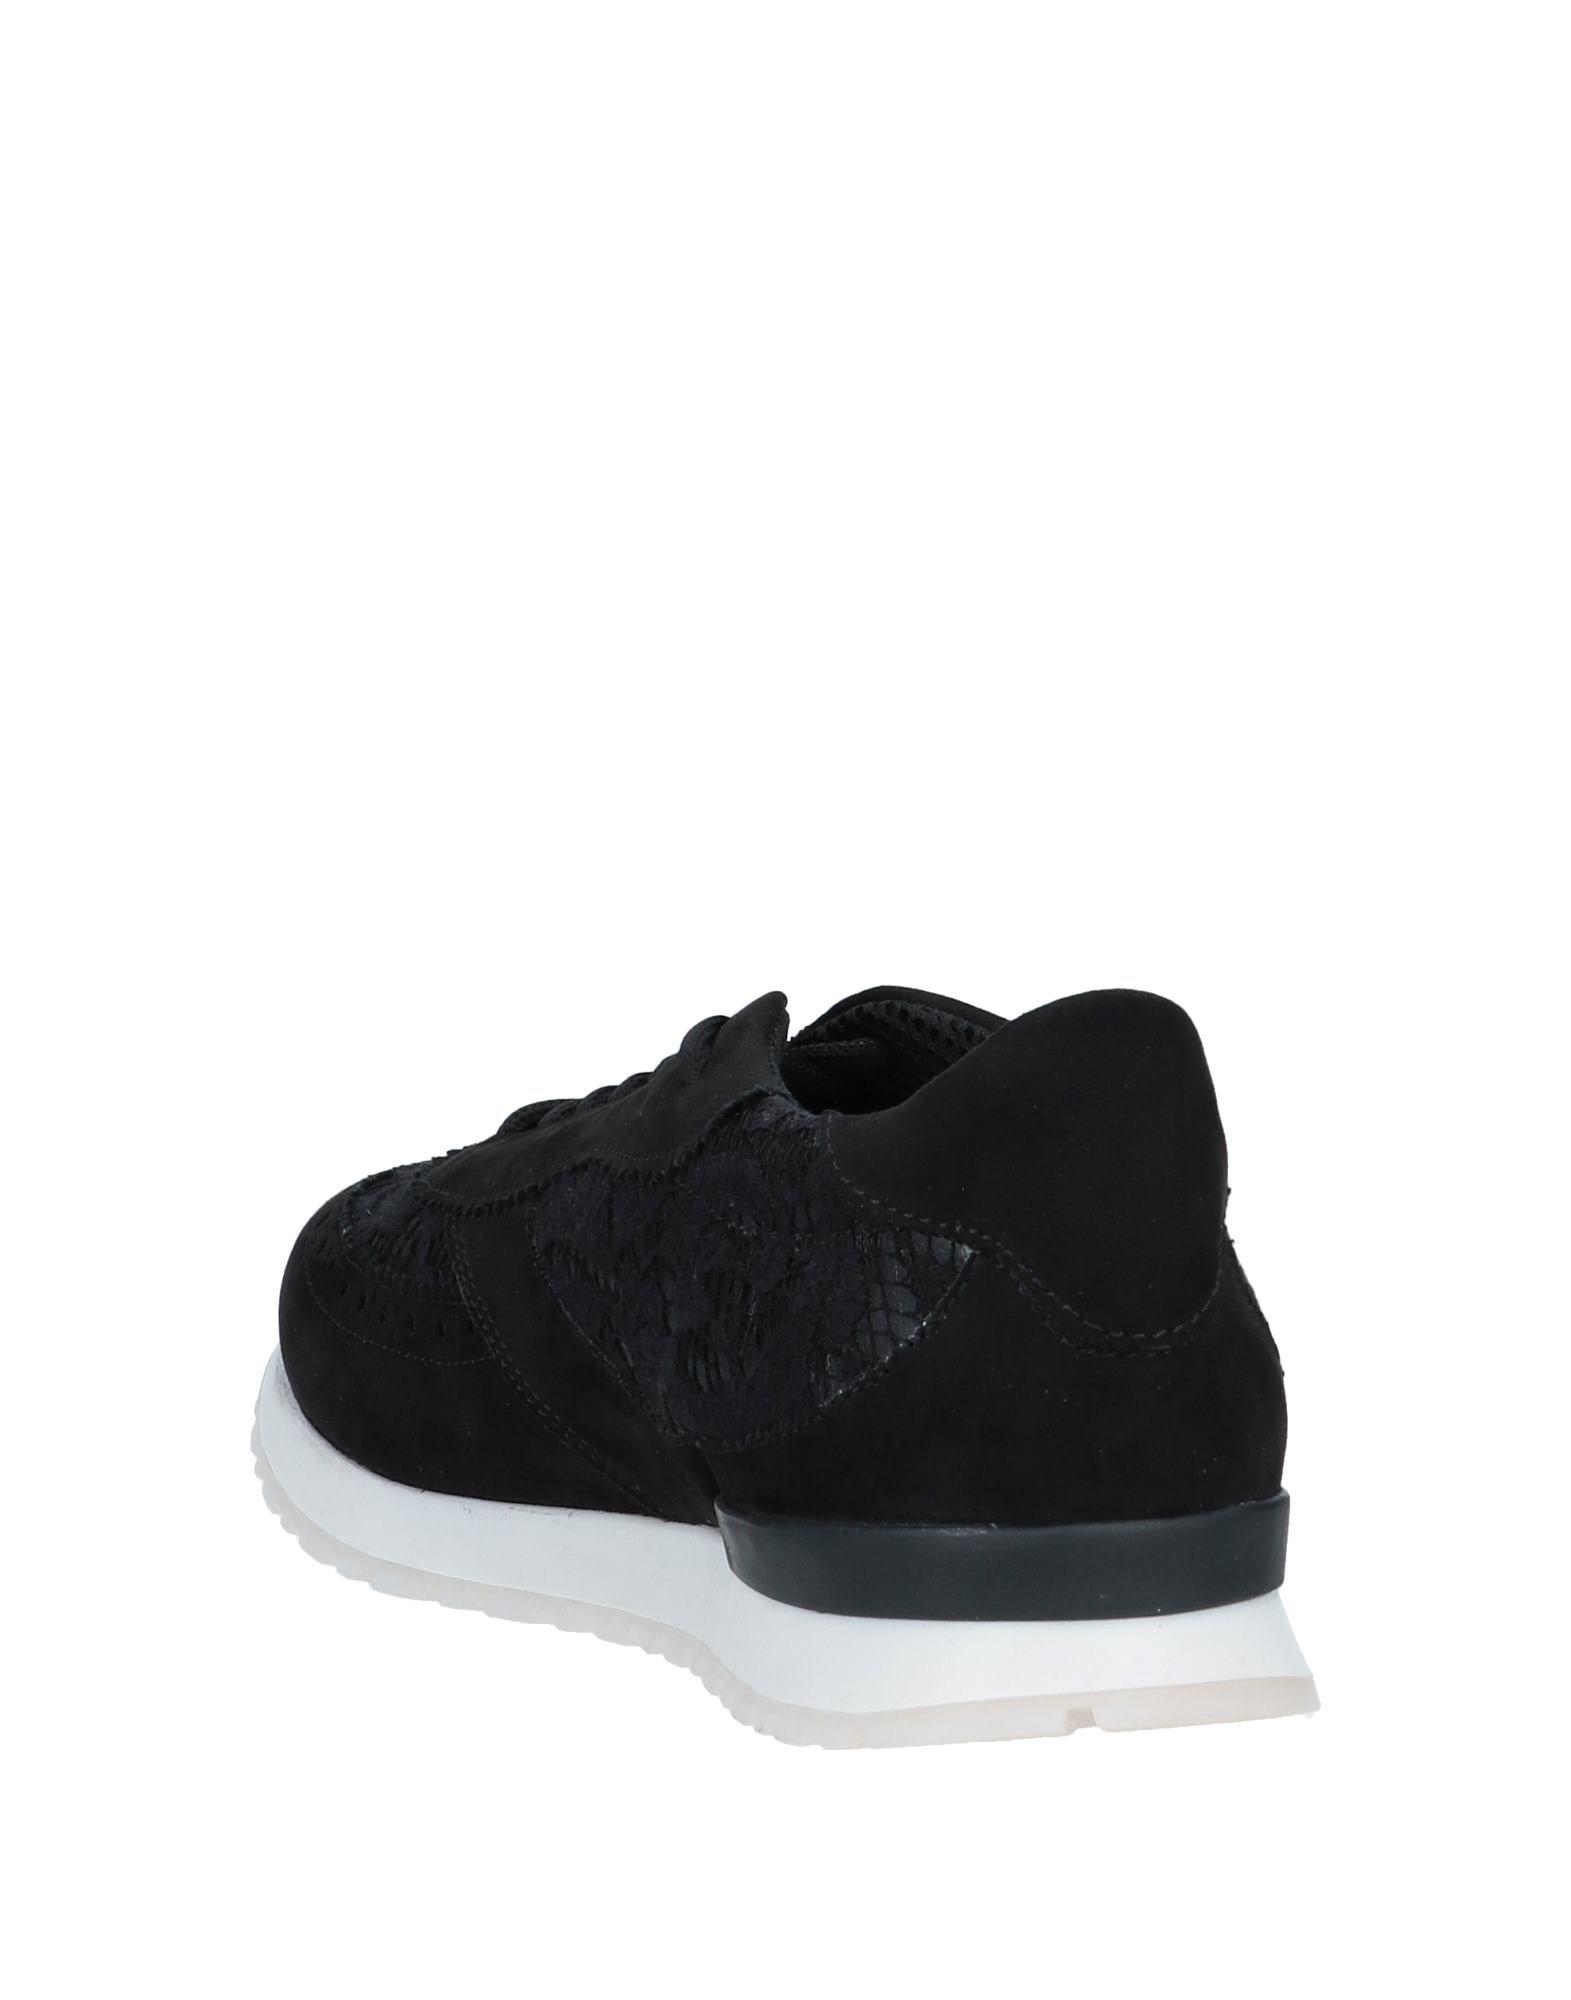 Twin-Set Simona Barbieri Sneakers - Women Twin-Set Twin-Set Twin-Set Simona Barbieri Sneakers online on  United Kingdom - 11560590HR 948ce0